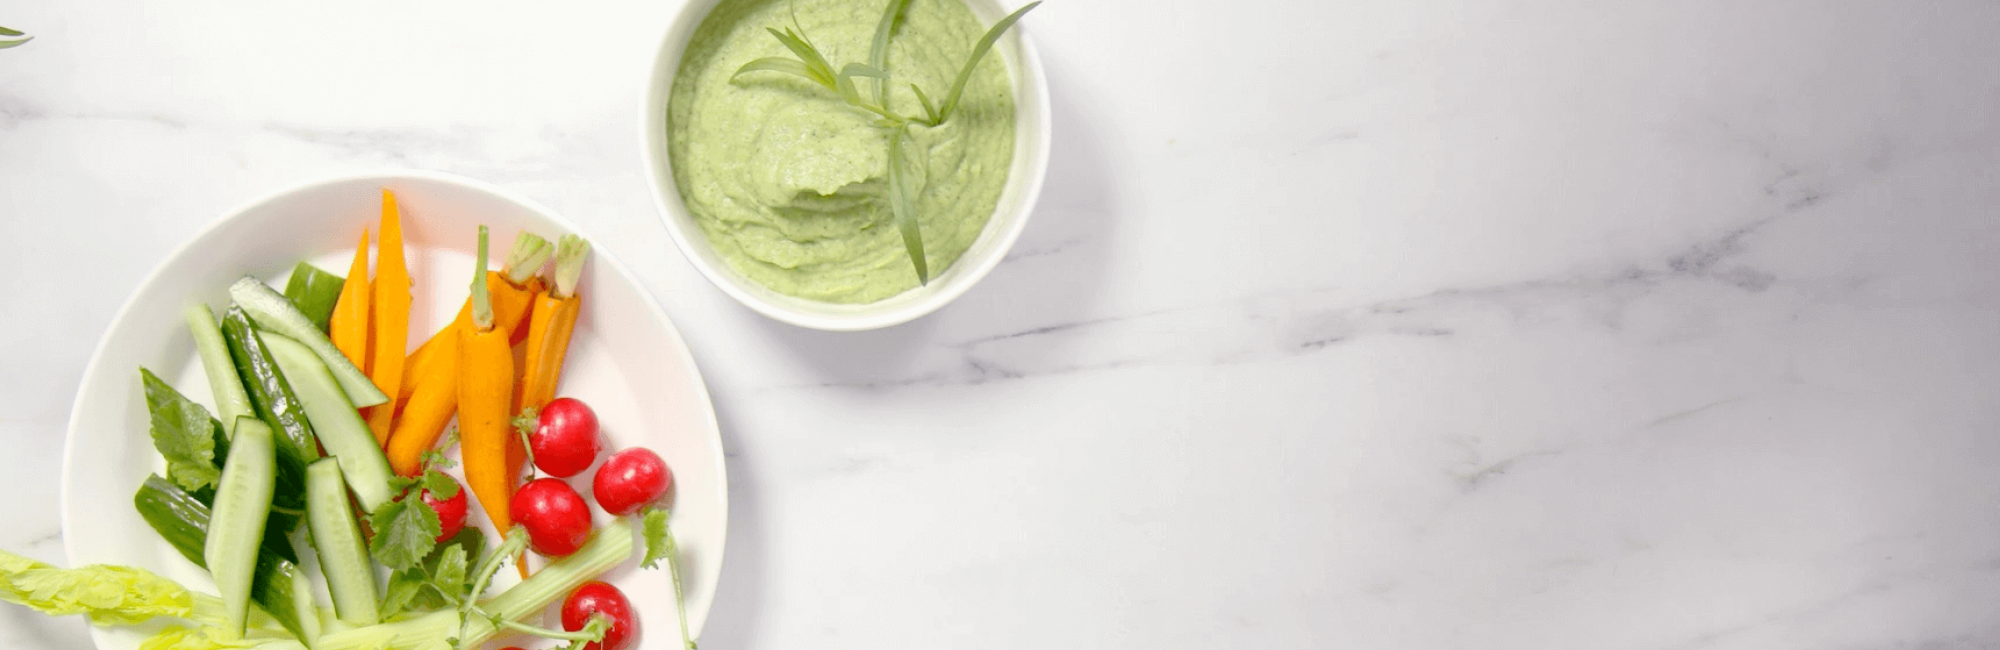 Rauwkostsalade, courgette, avocado